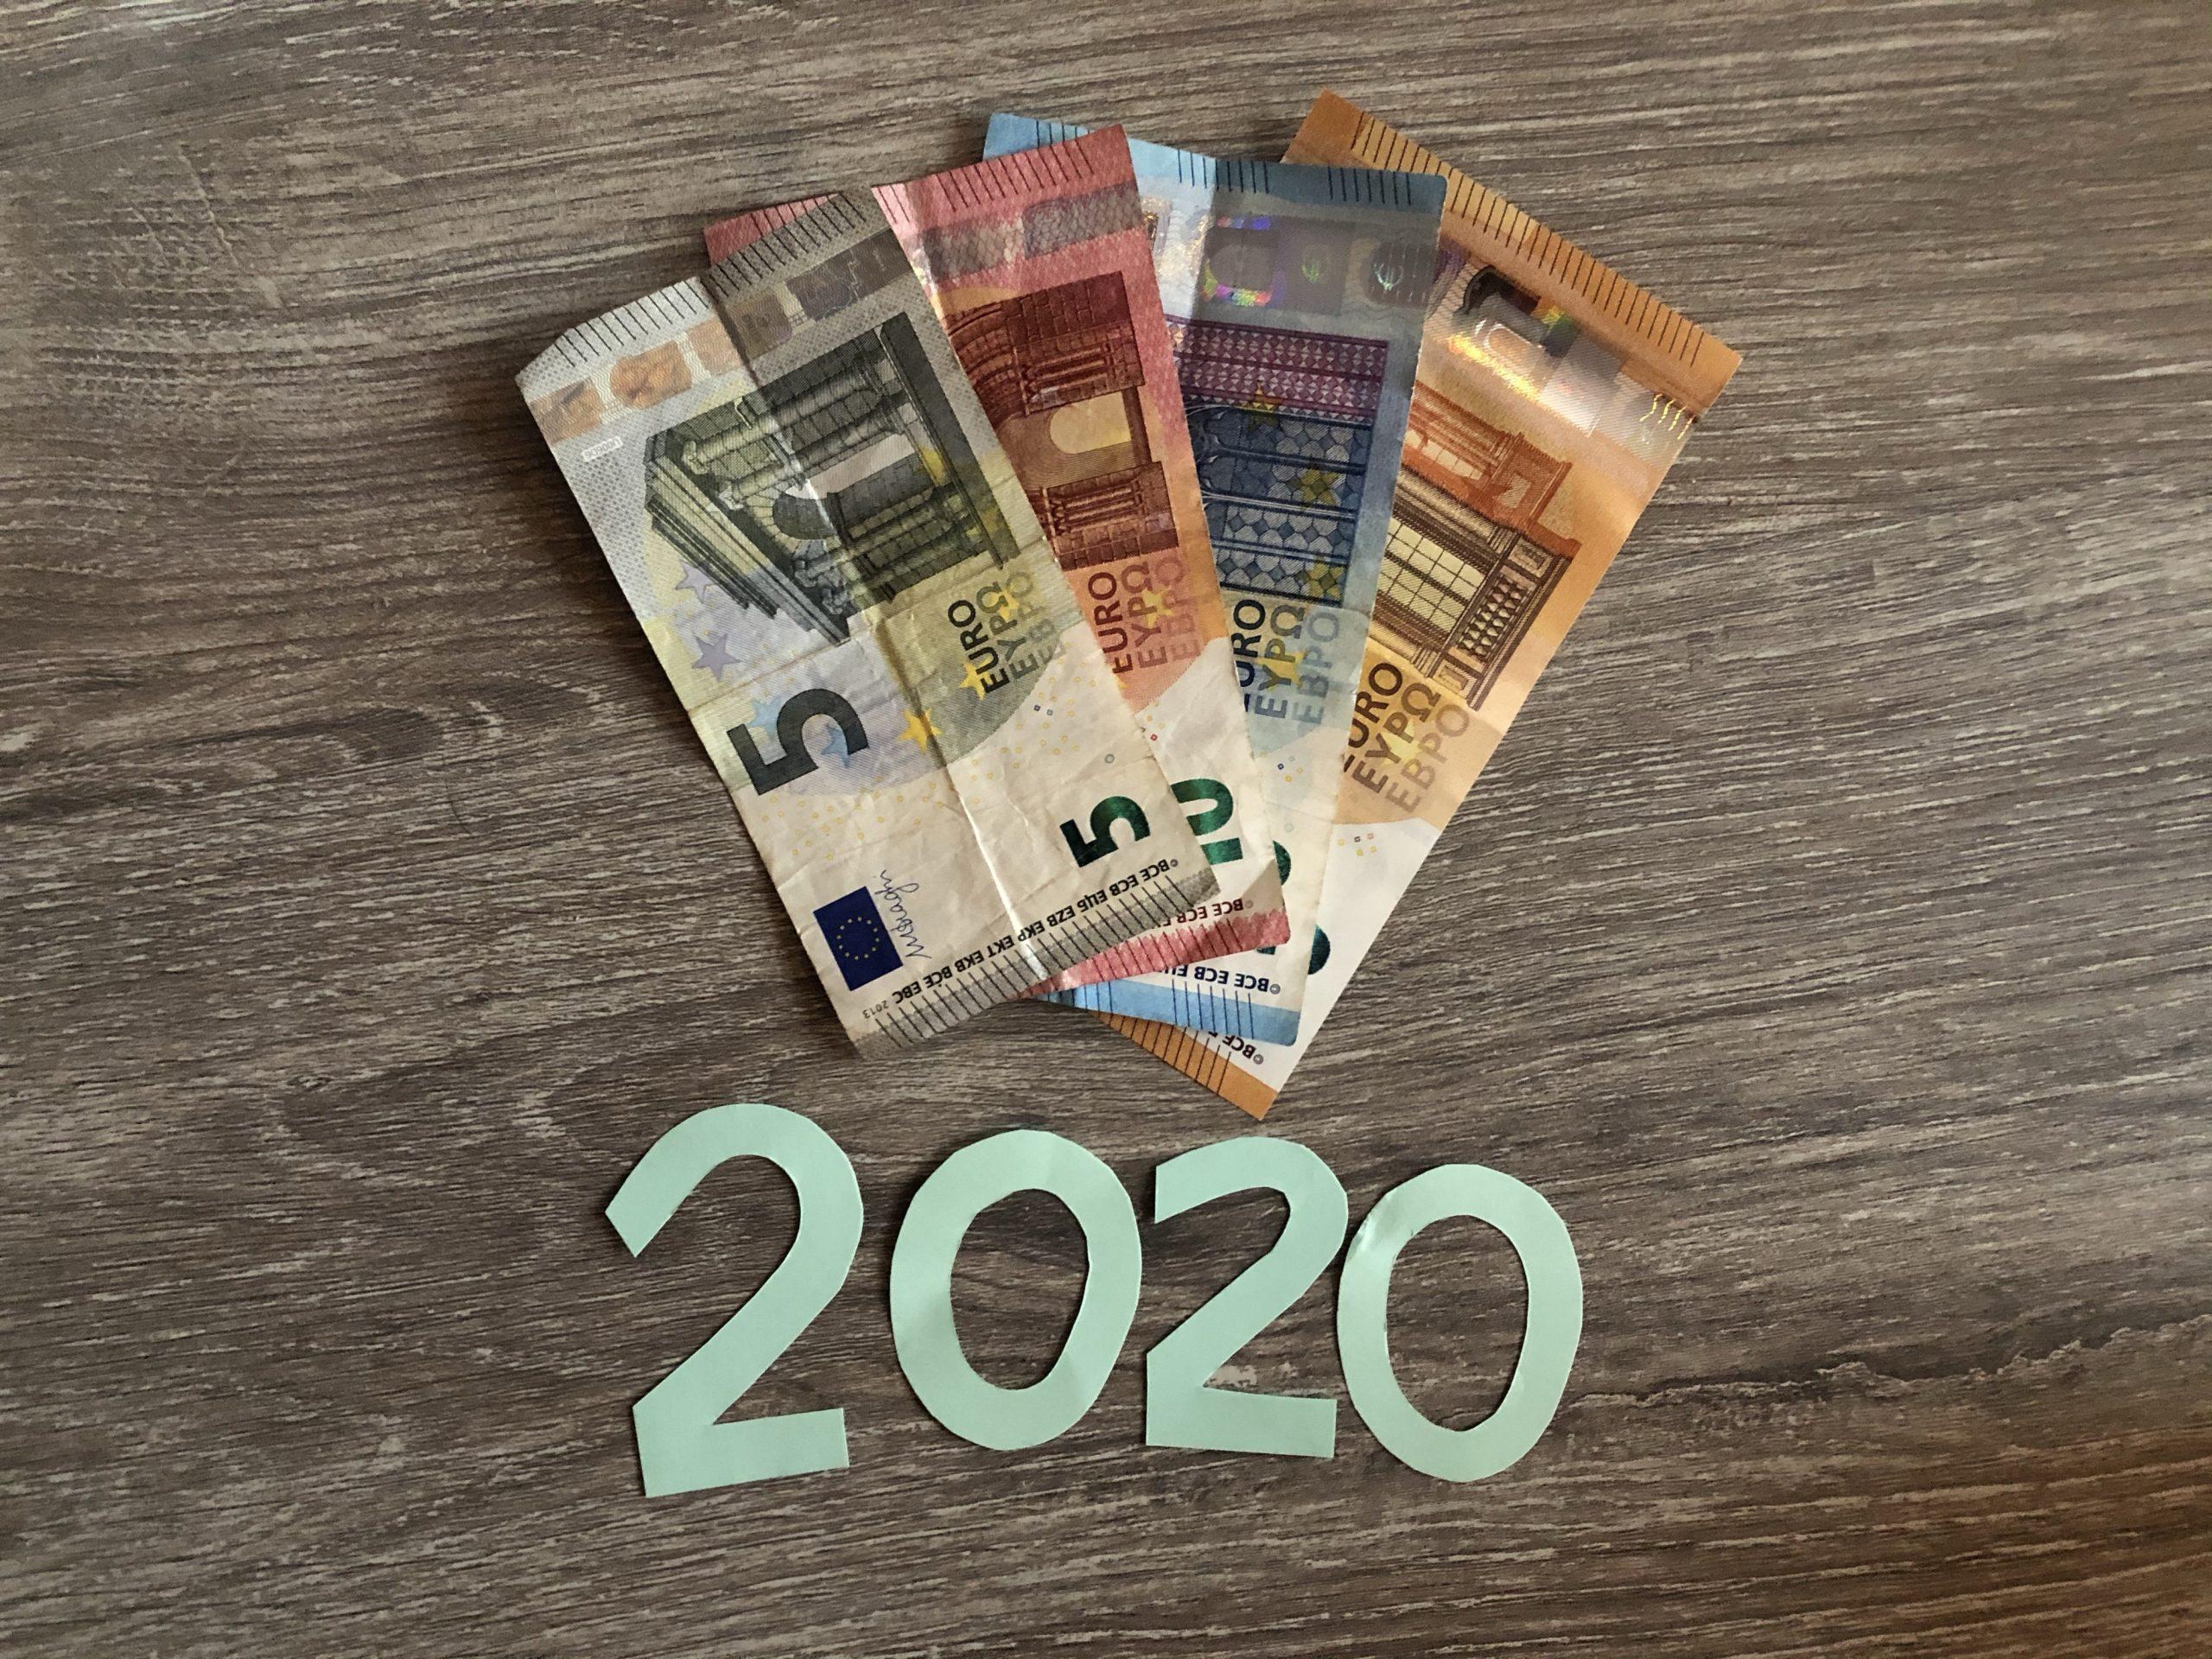 Totale extra inkomsten 2020